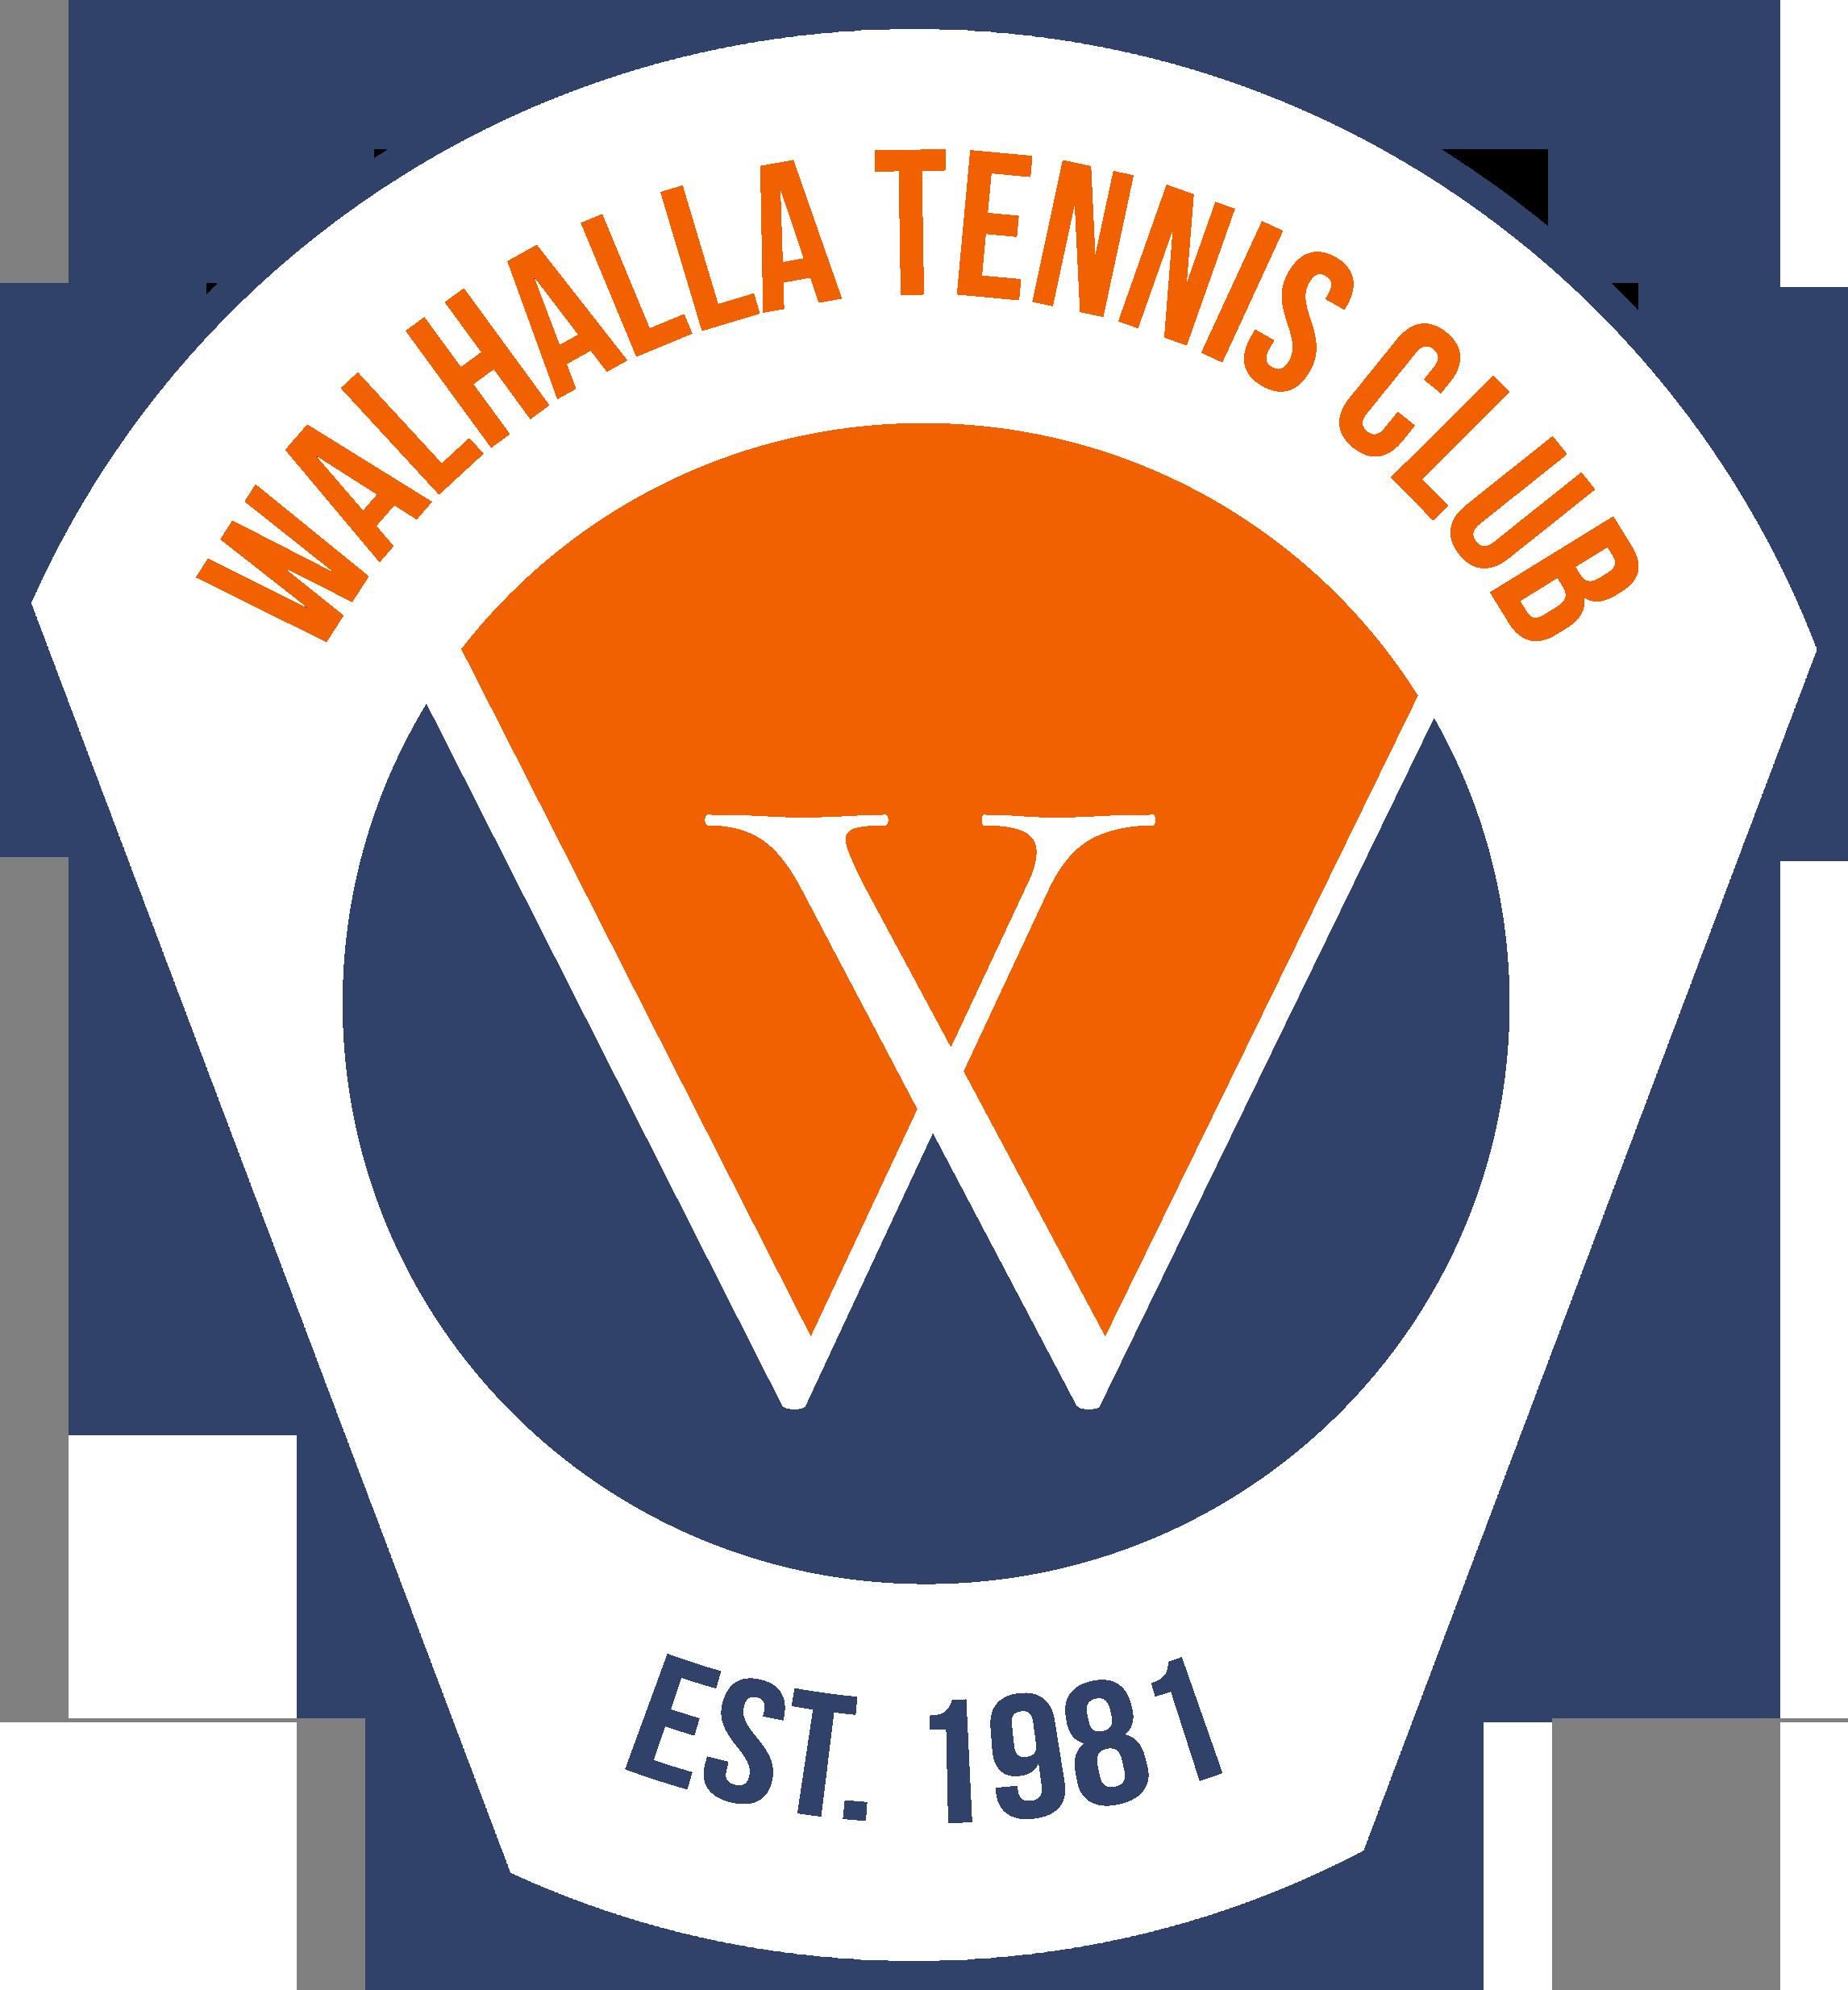 GTC Walhalla